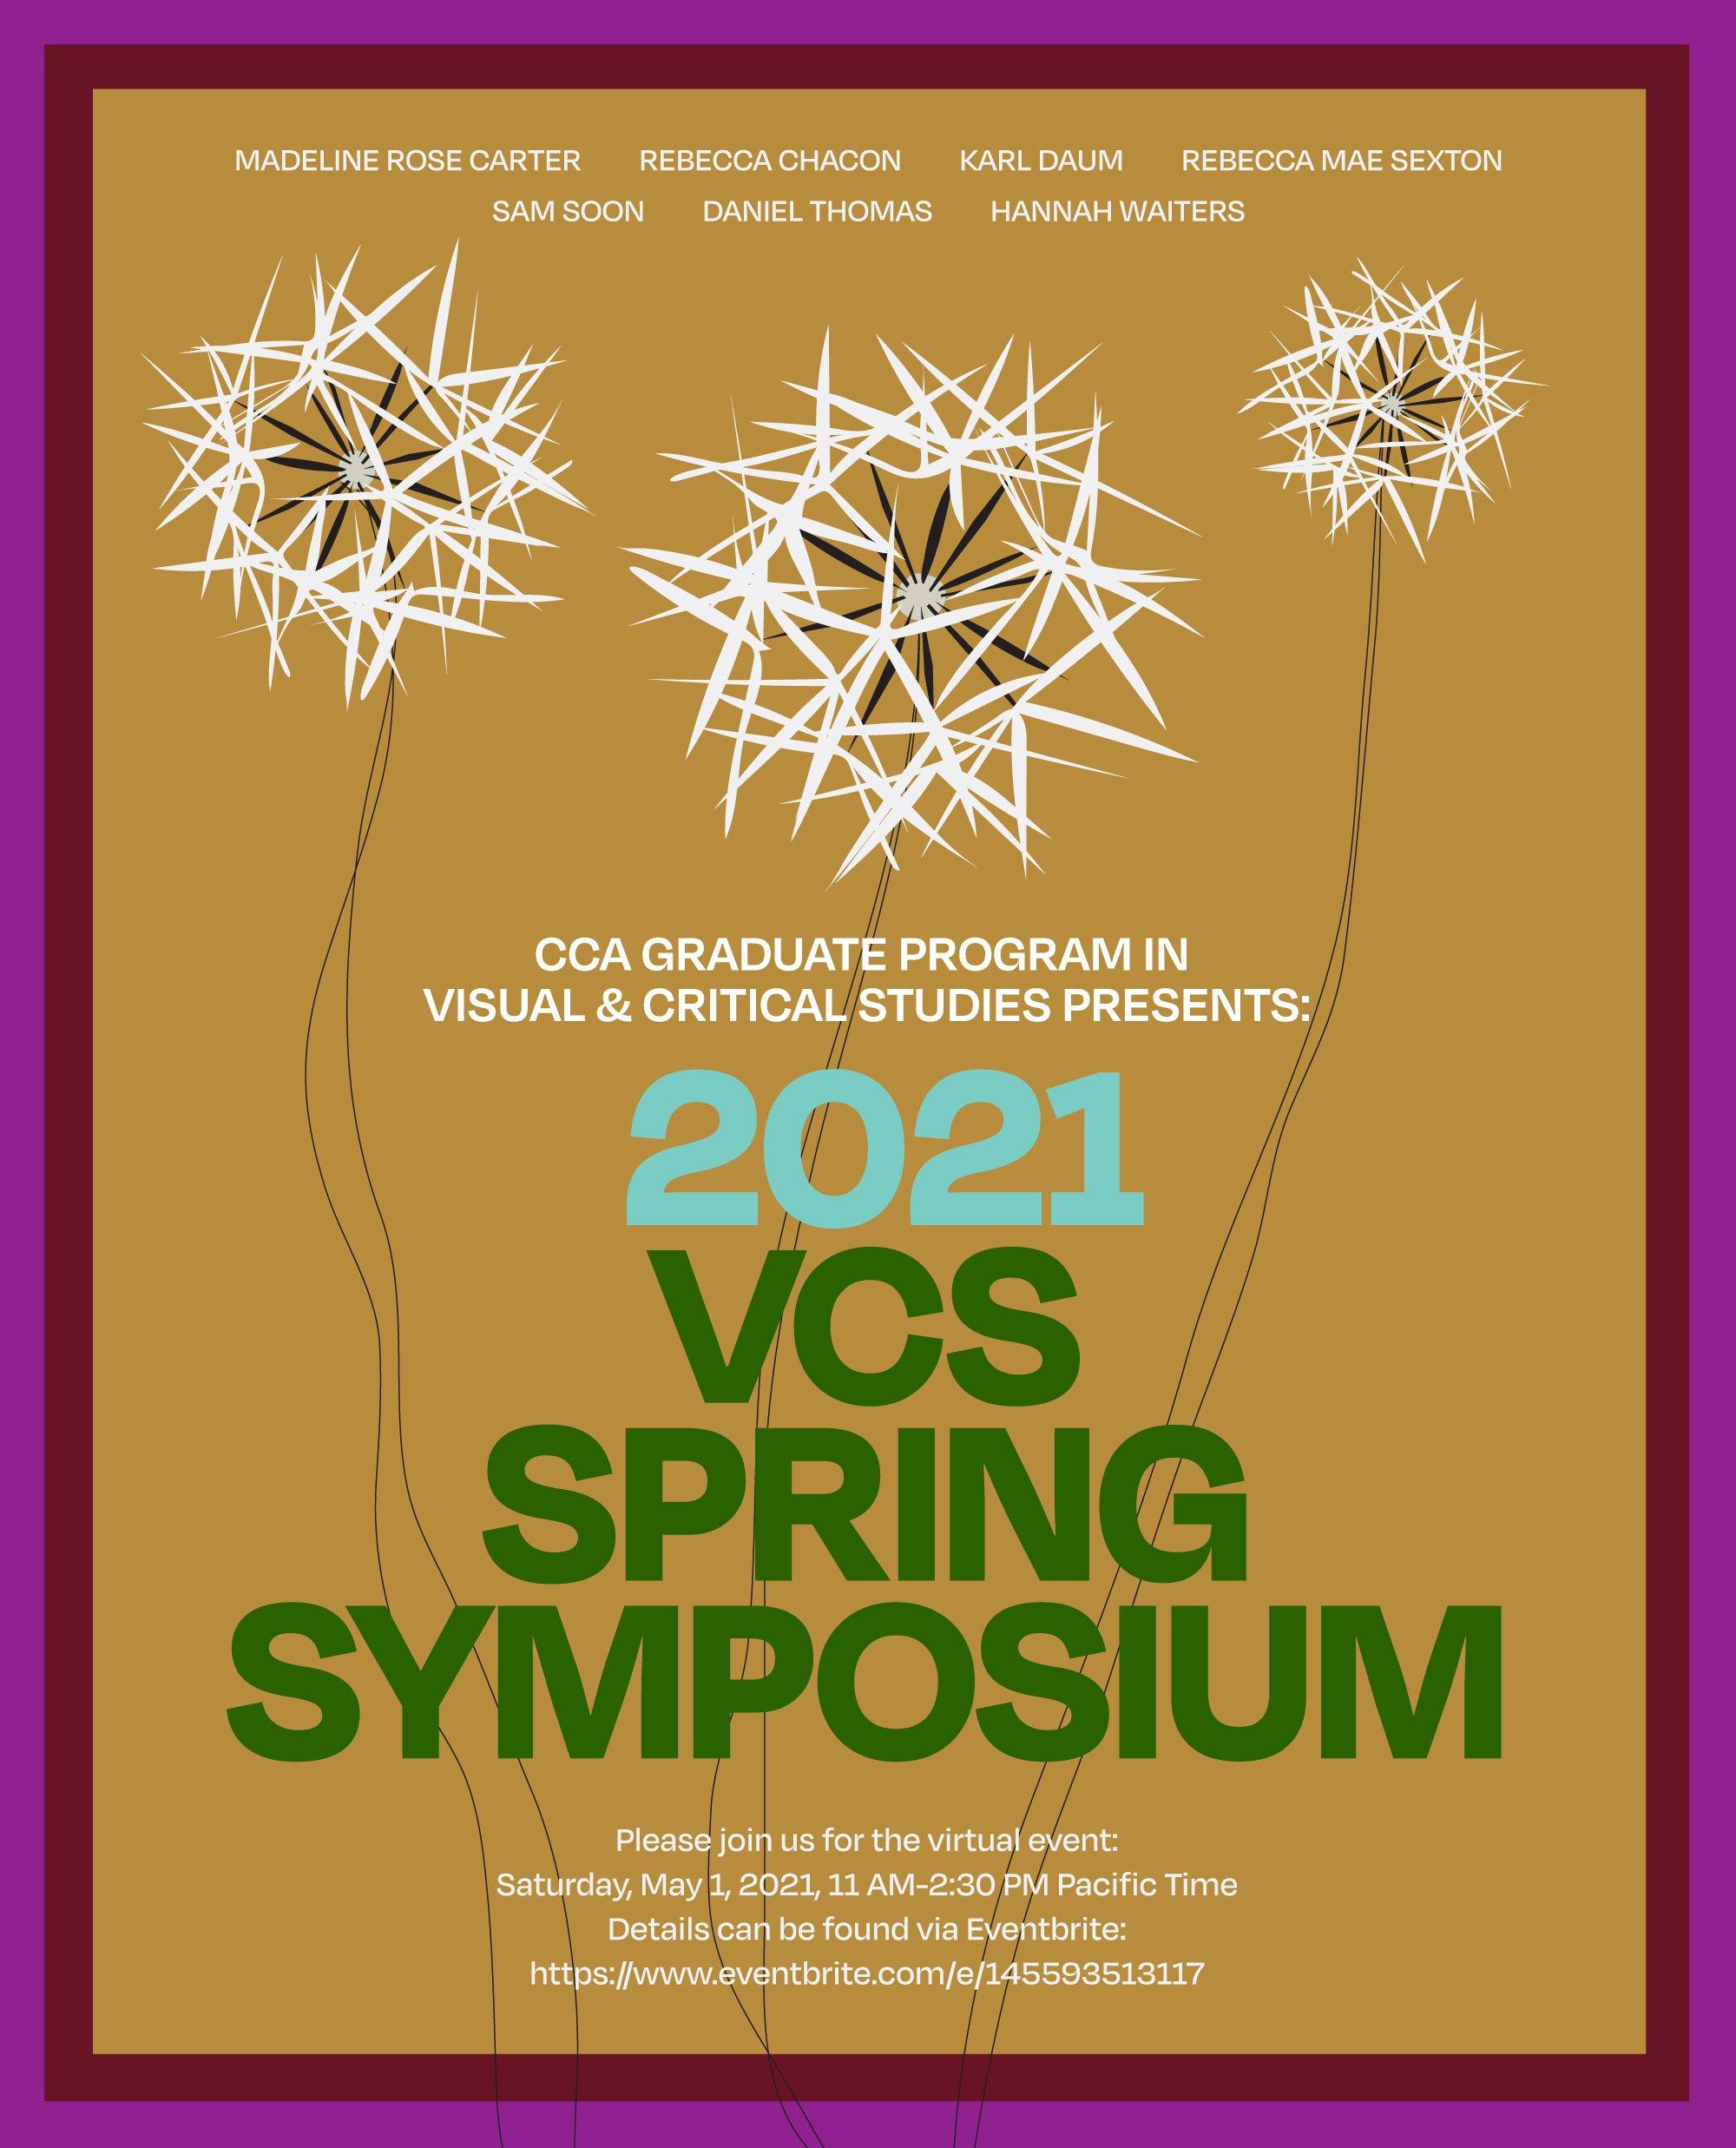 VCS 2021 Spring Symposium